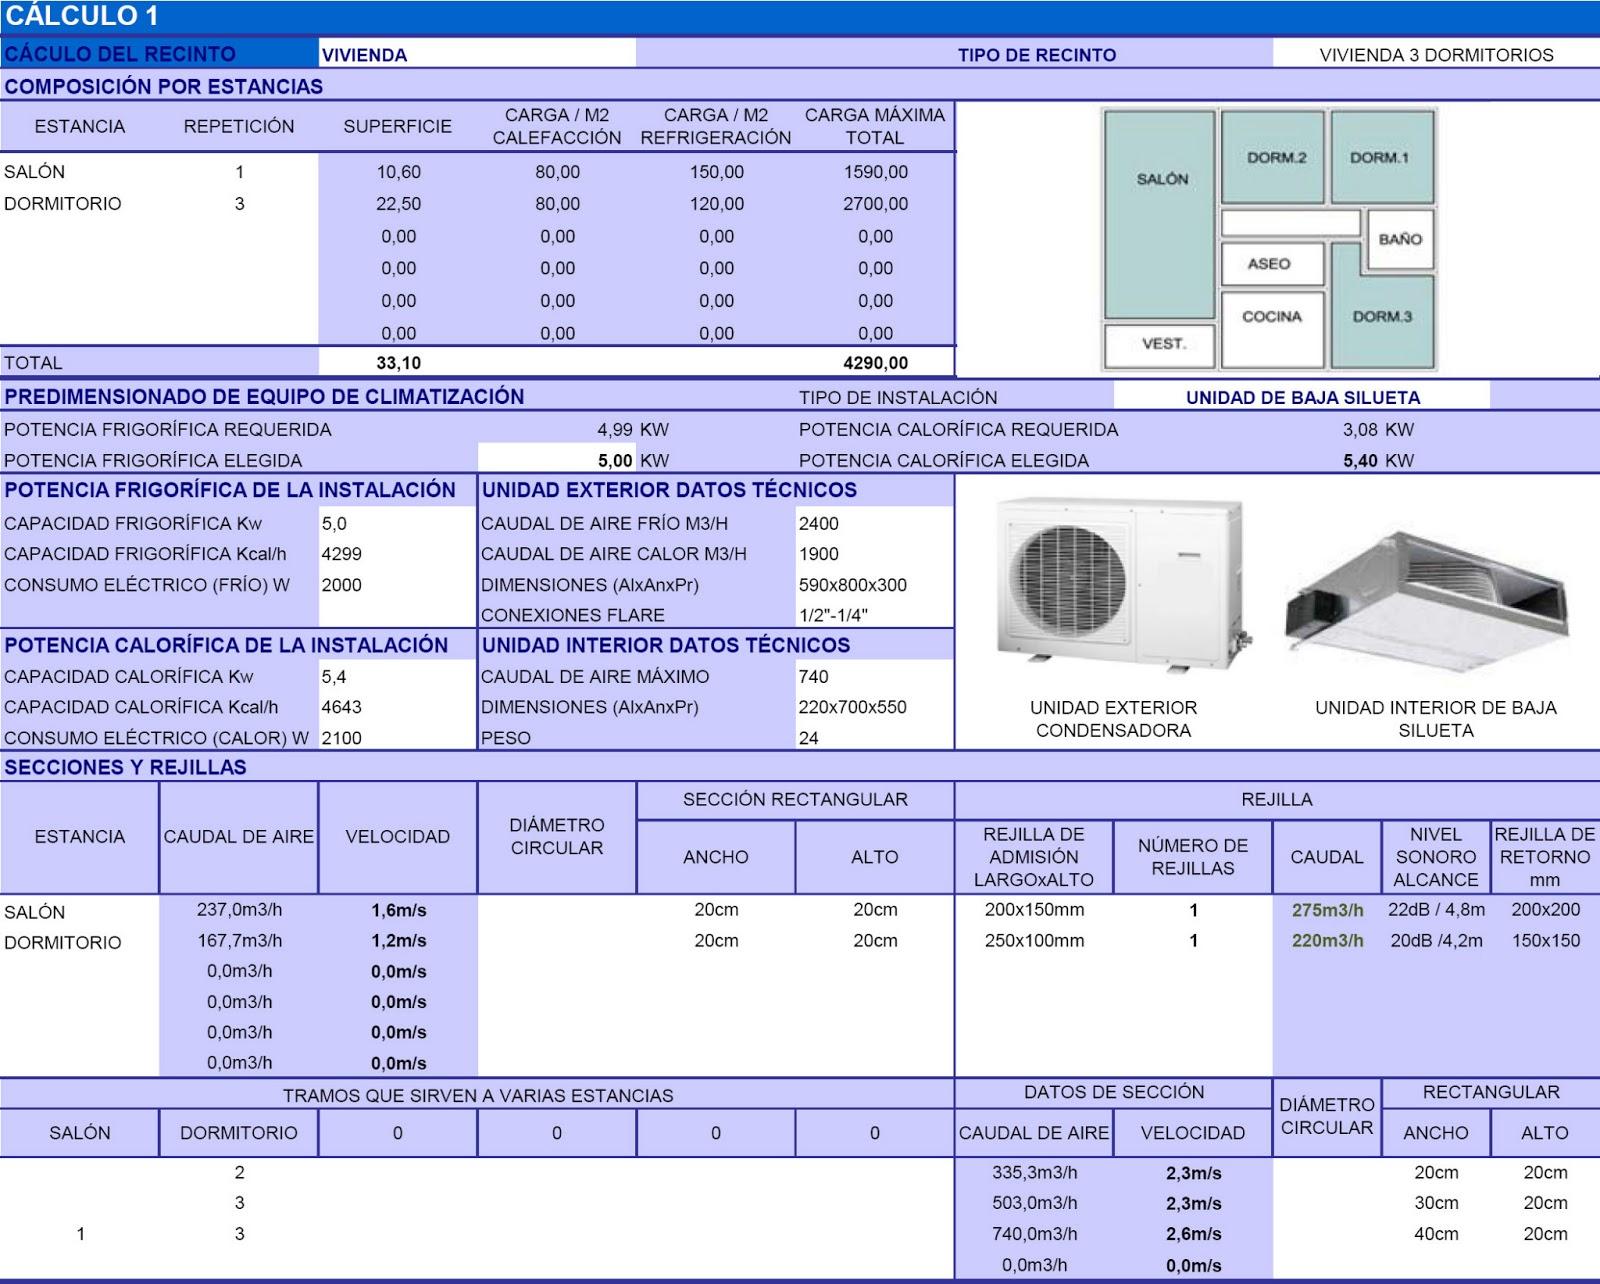 HVAC Load Calculation Spreadsheet http://www.pic2fly.com/HVAC+Load ...